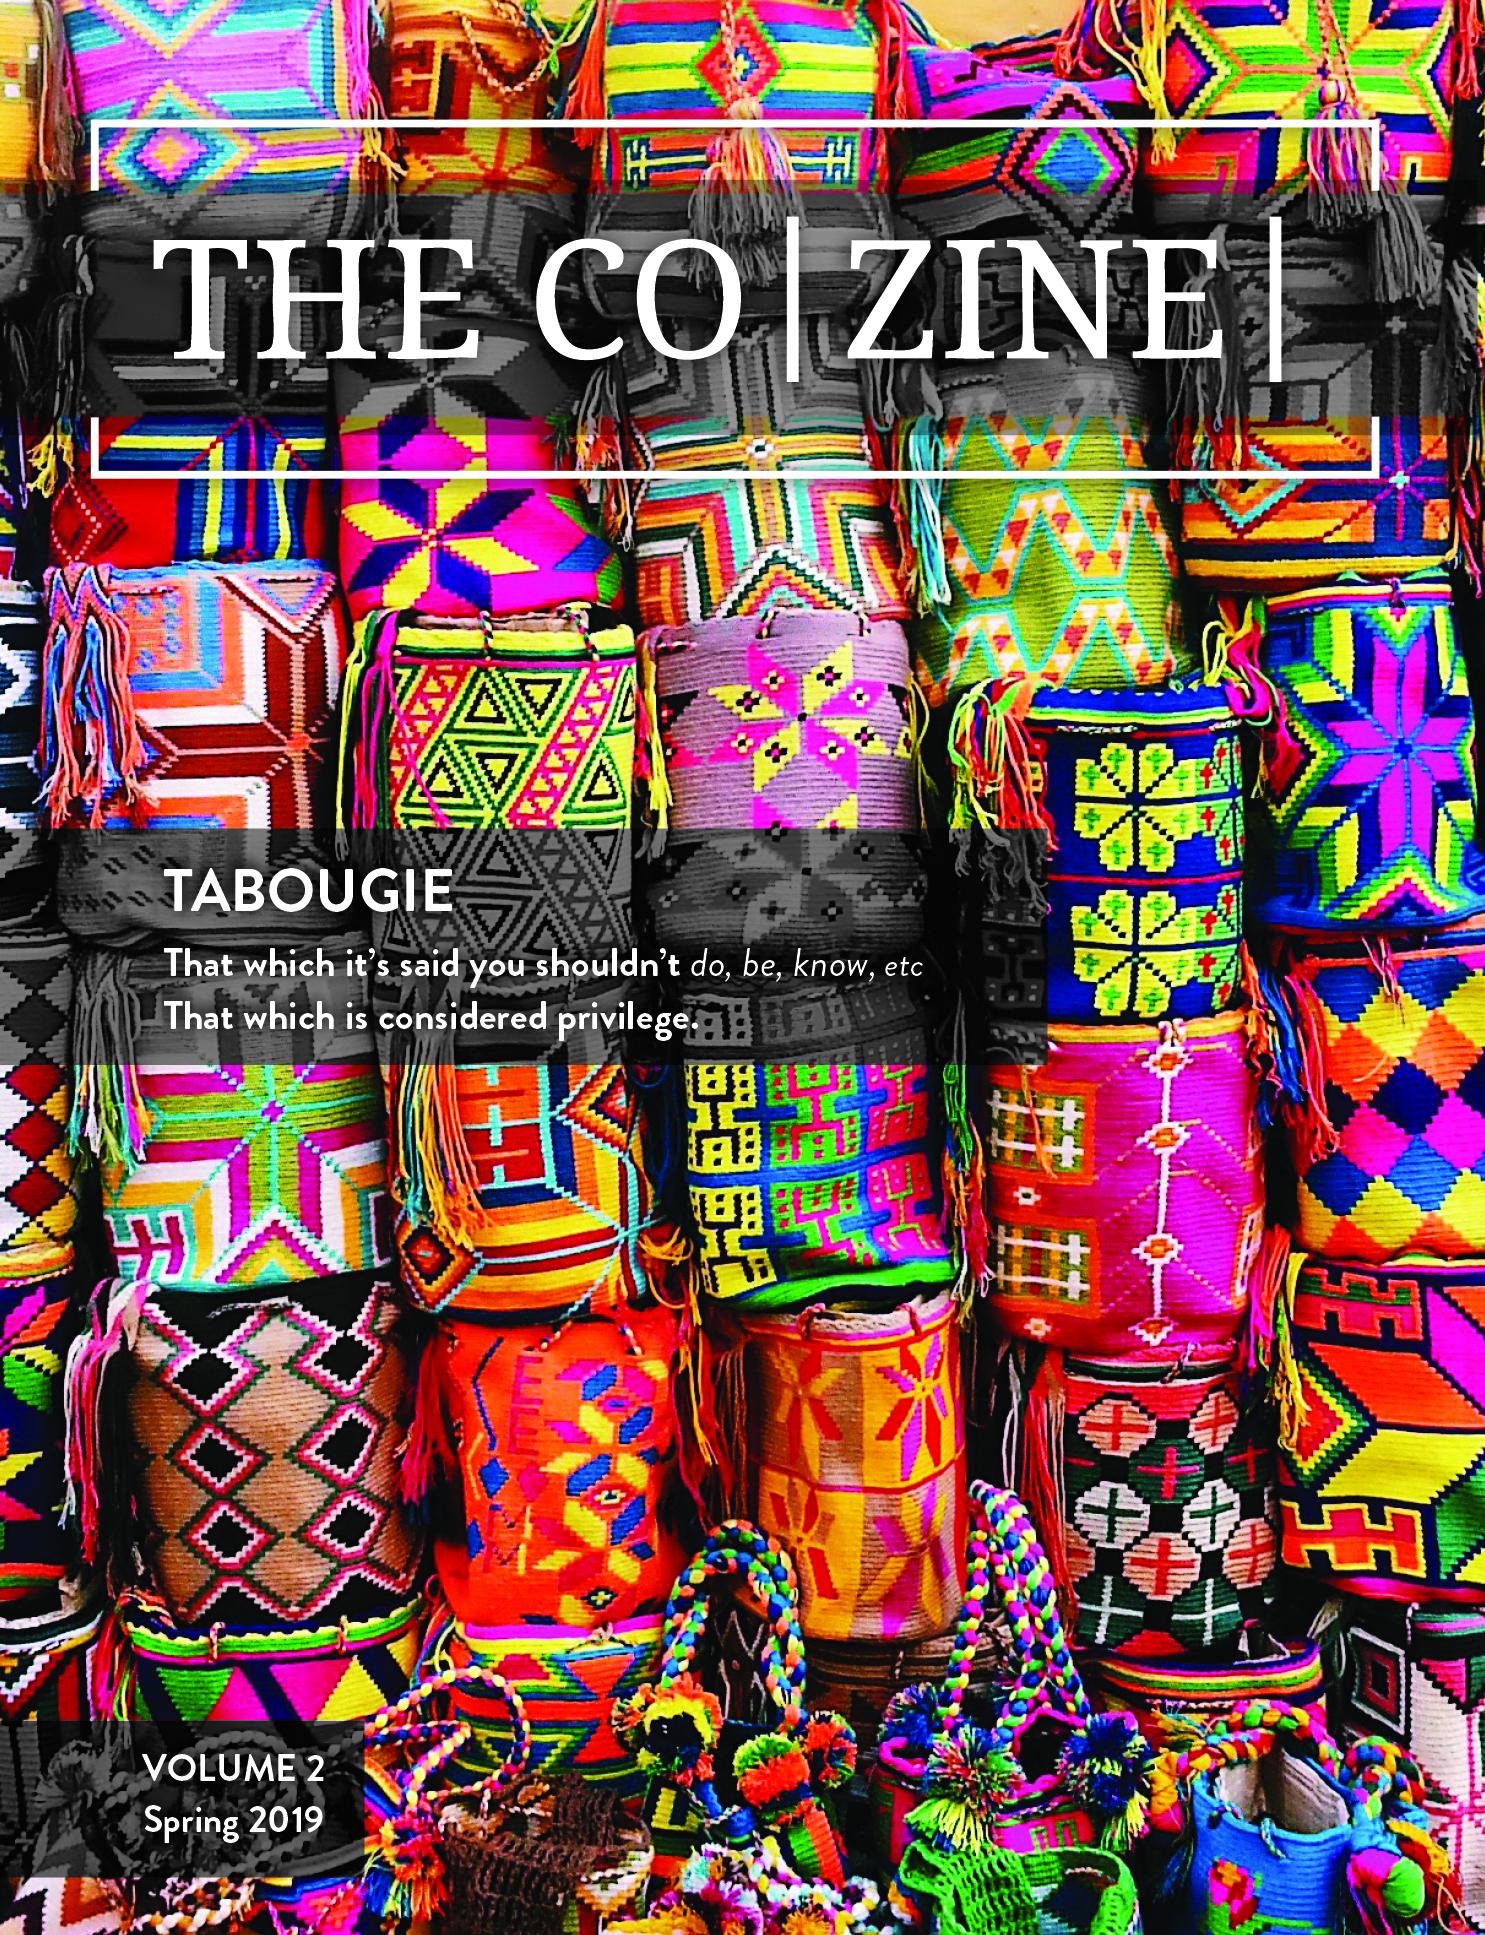 Co-Zine_Vol2_Cover_B.jpg